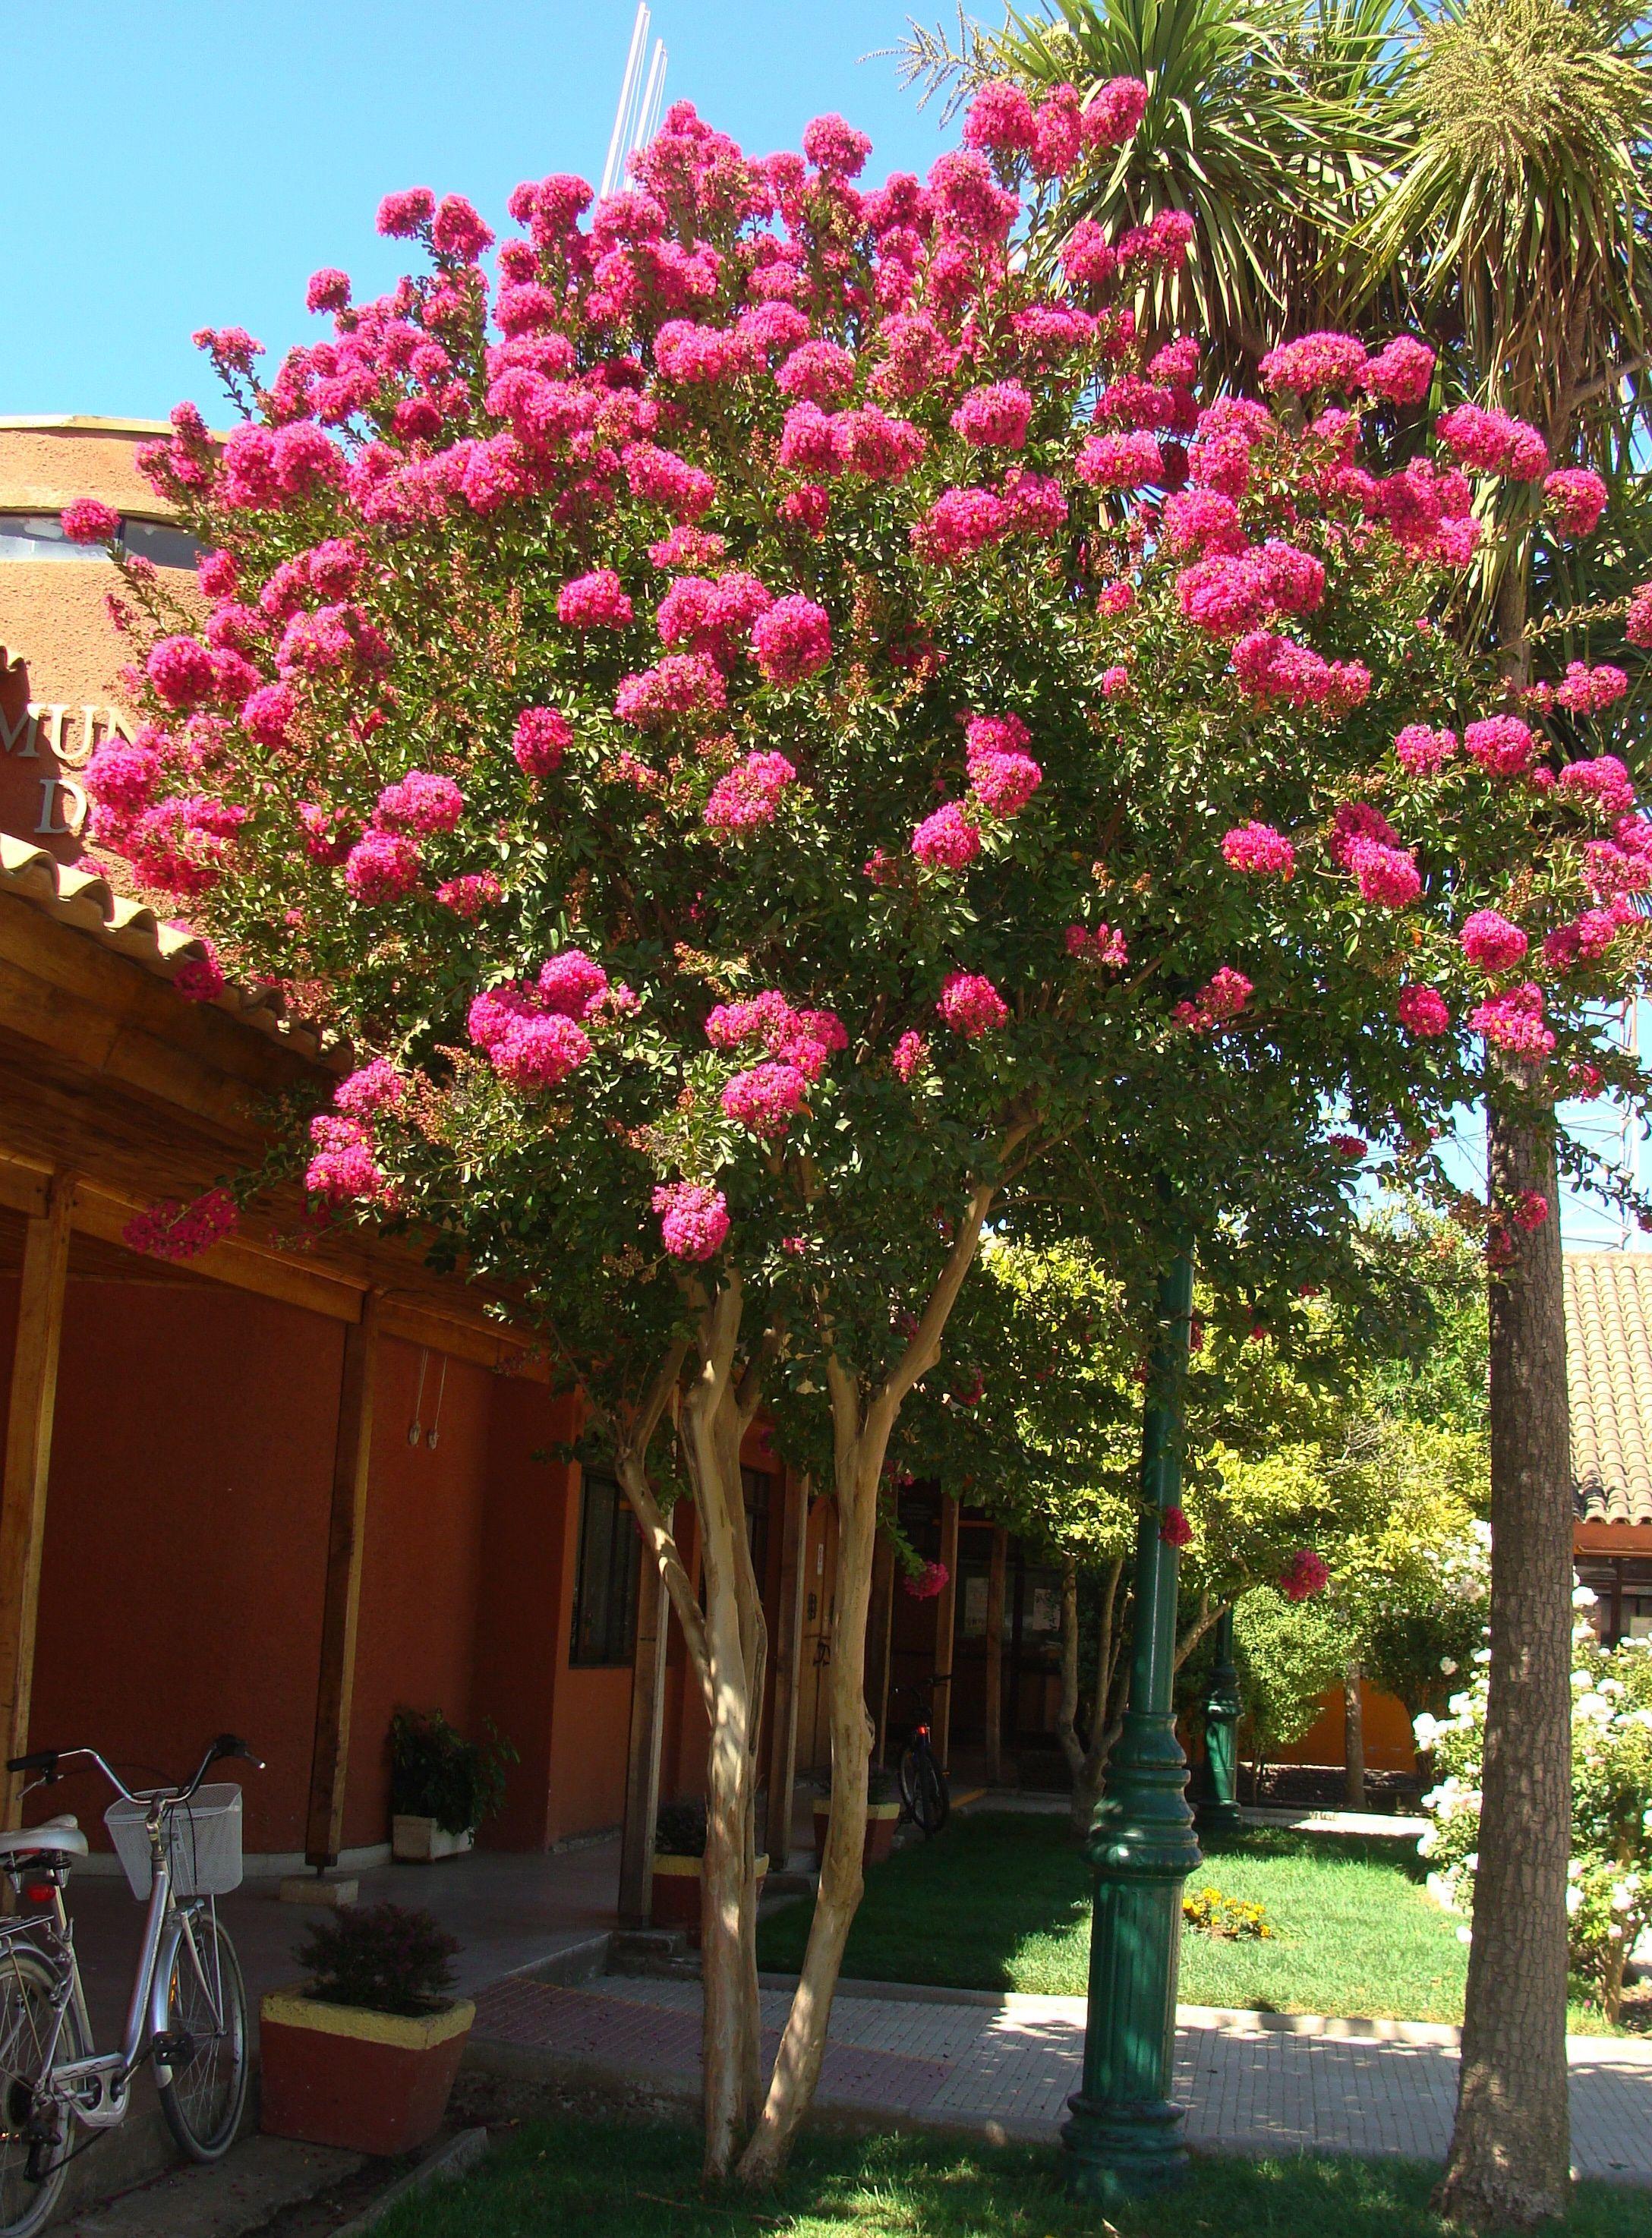 Crespon jardiner a pinterest cresp n arboles for Arboles con flores para jardin